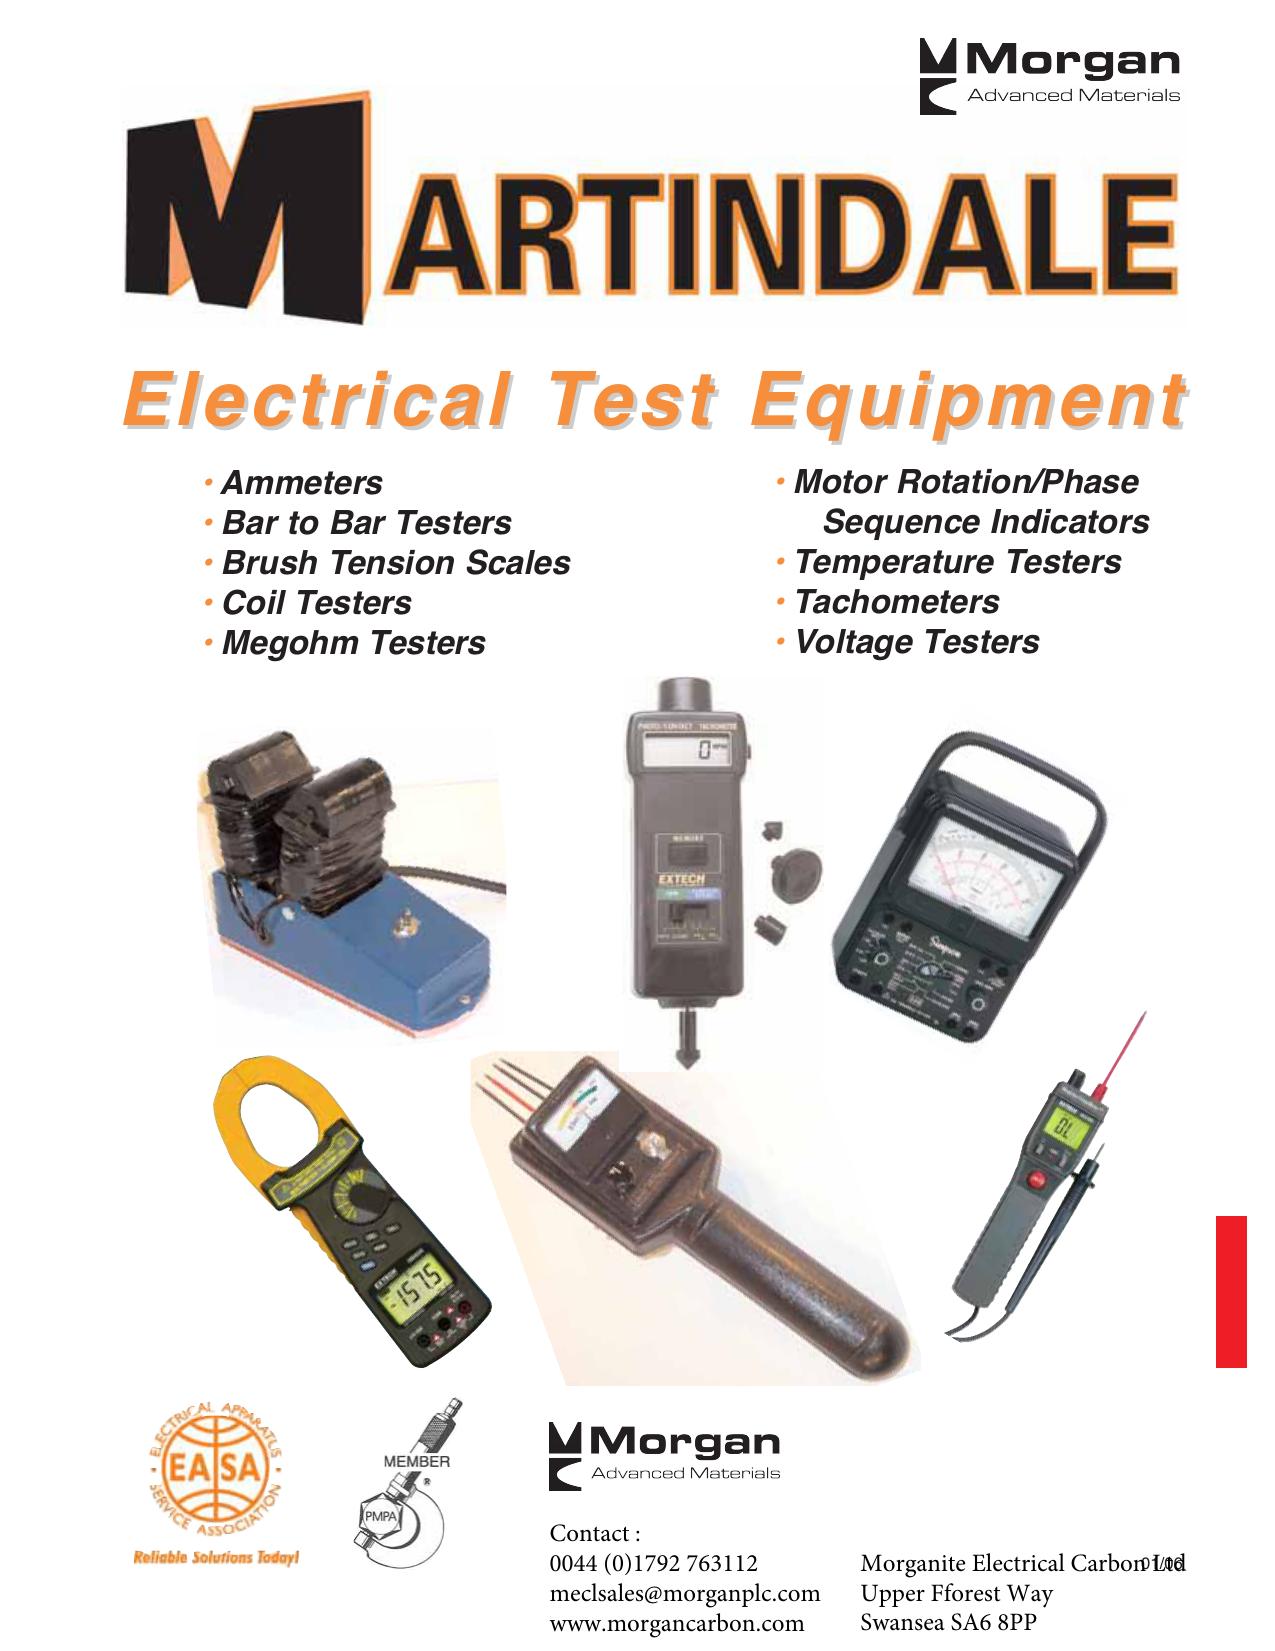 Electrical Test Equipment - Morgan Advanced Materials